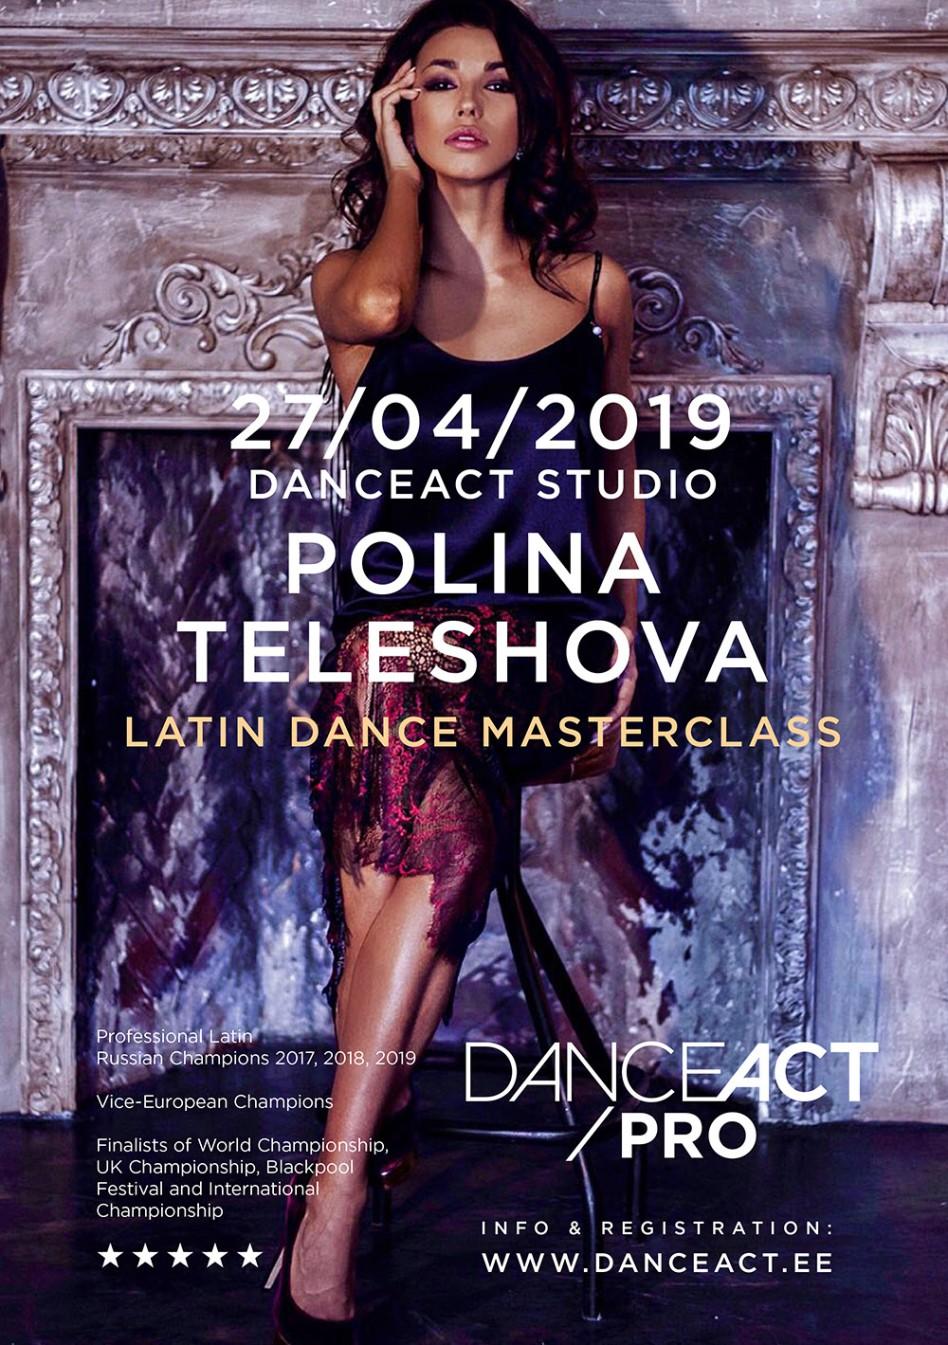 POLINA TELESHOVA latin dance masterclasses   April 27th @ DanceAct